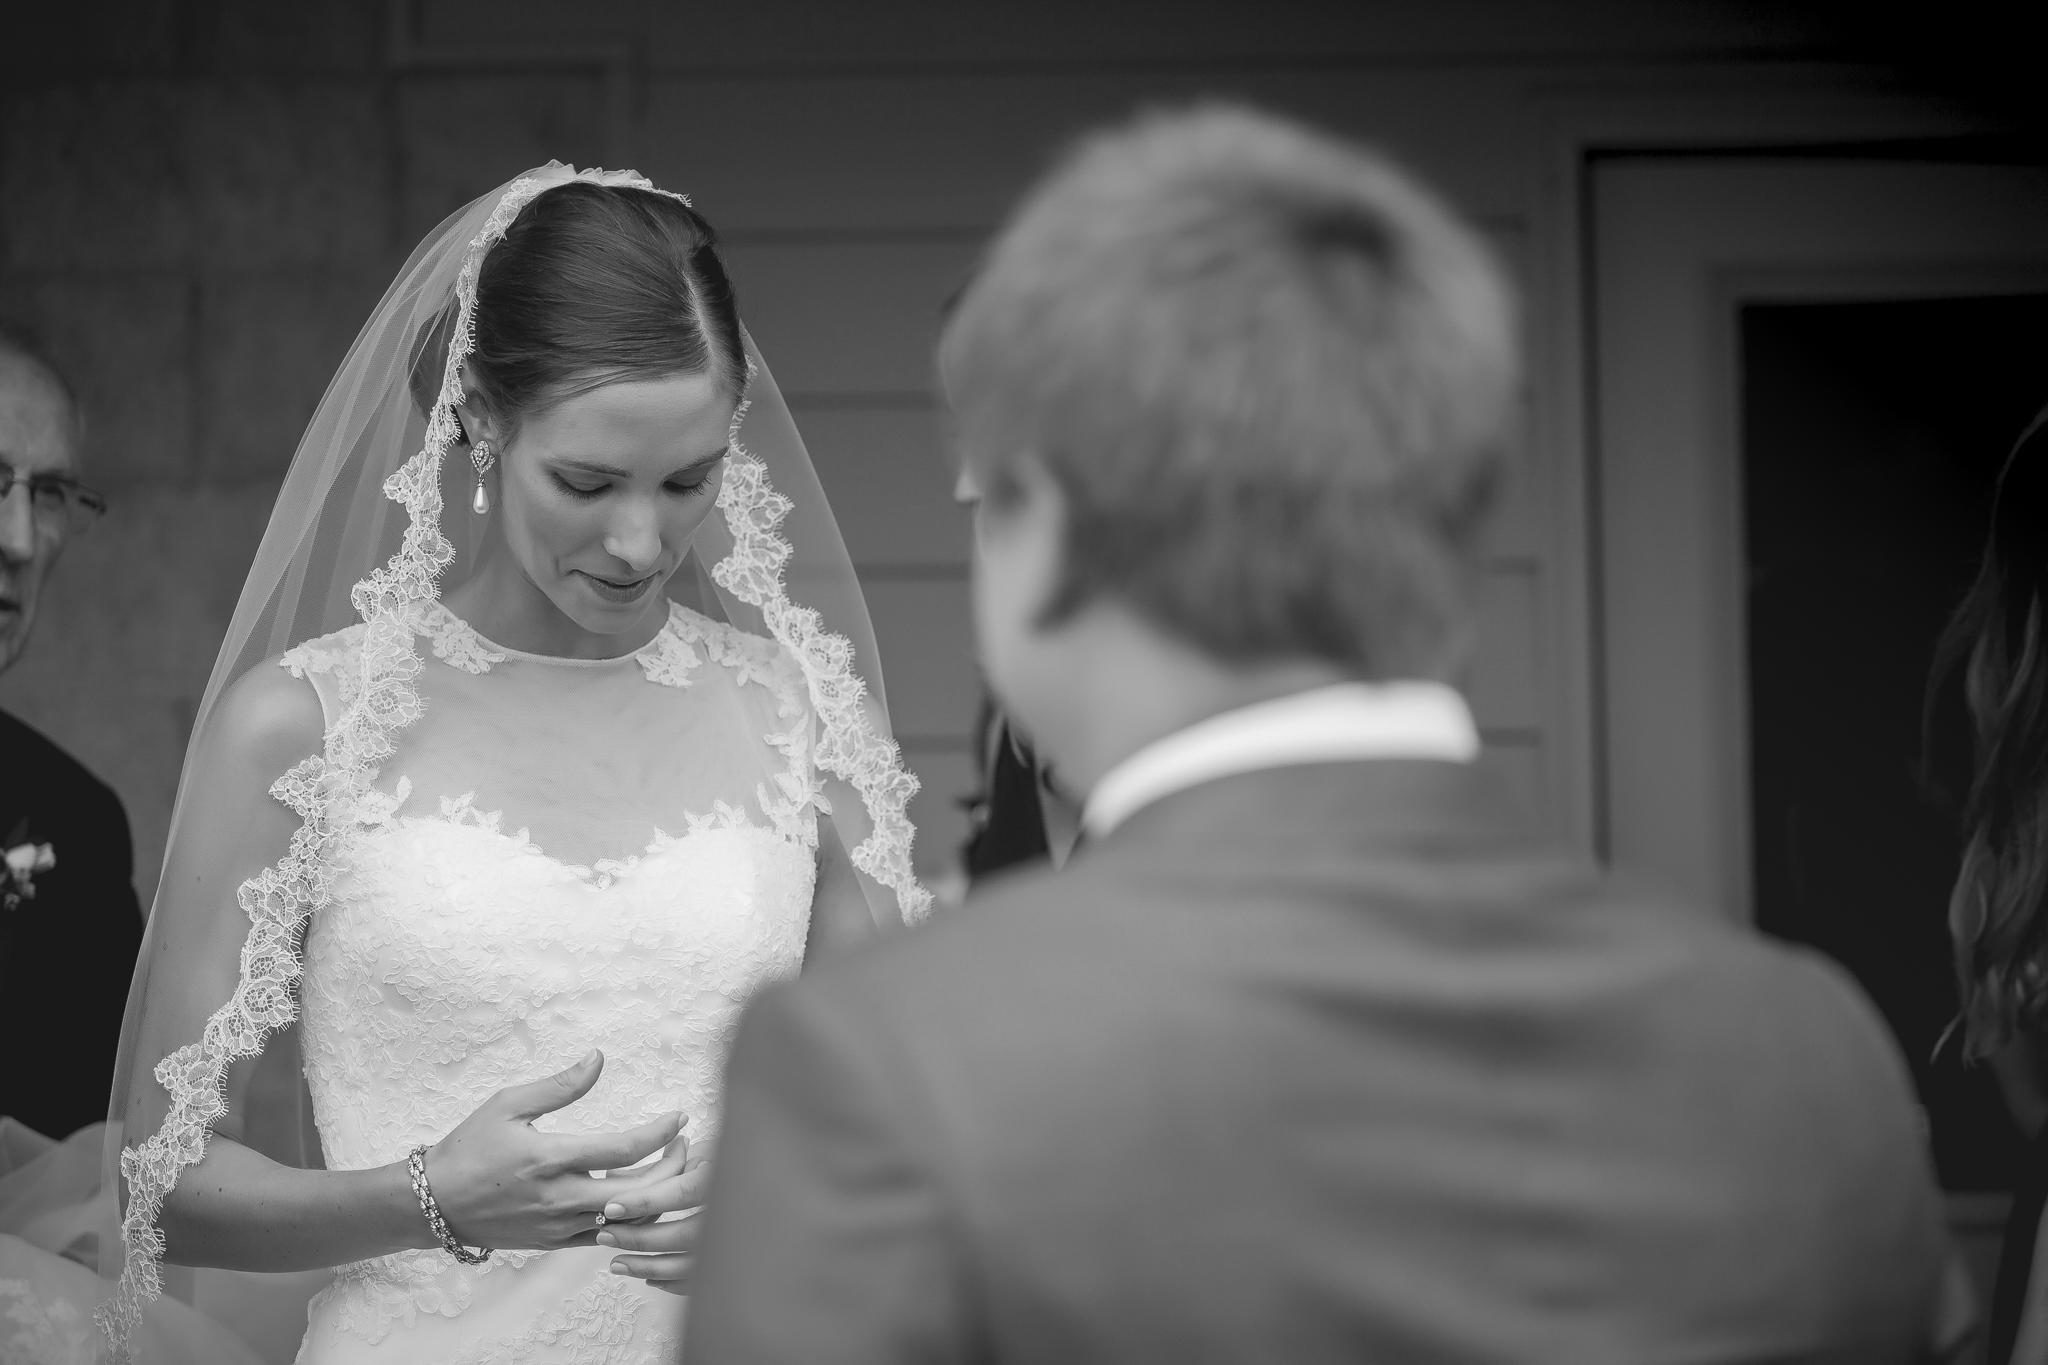 james j hill library wedding photography-8.jpg